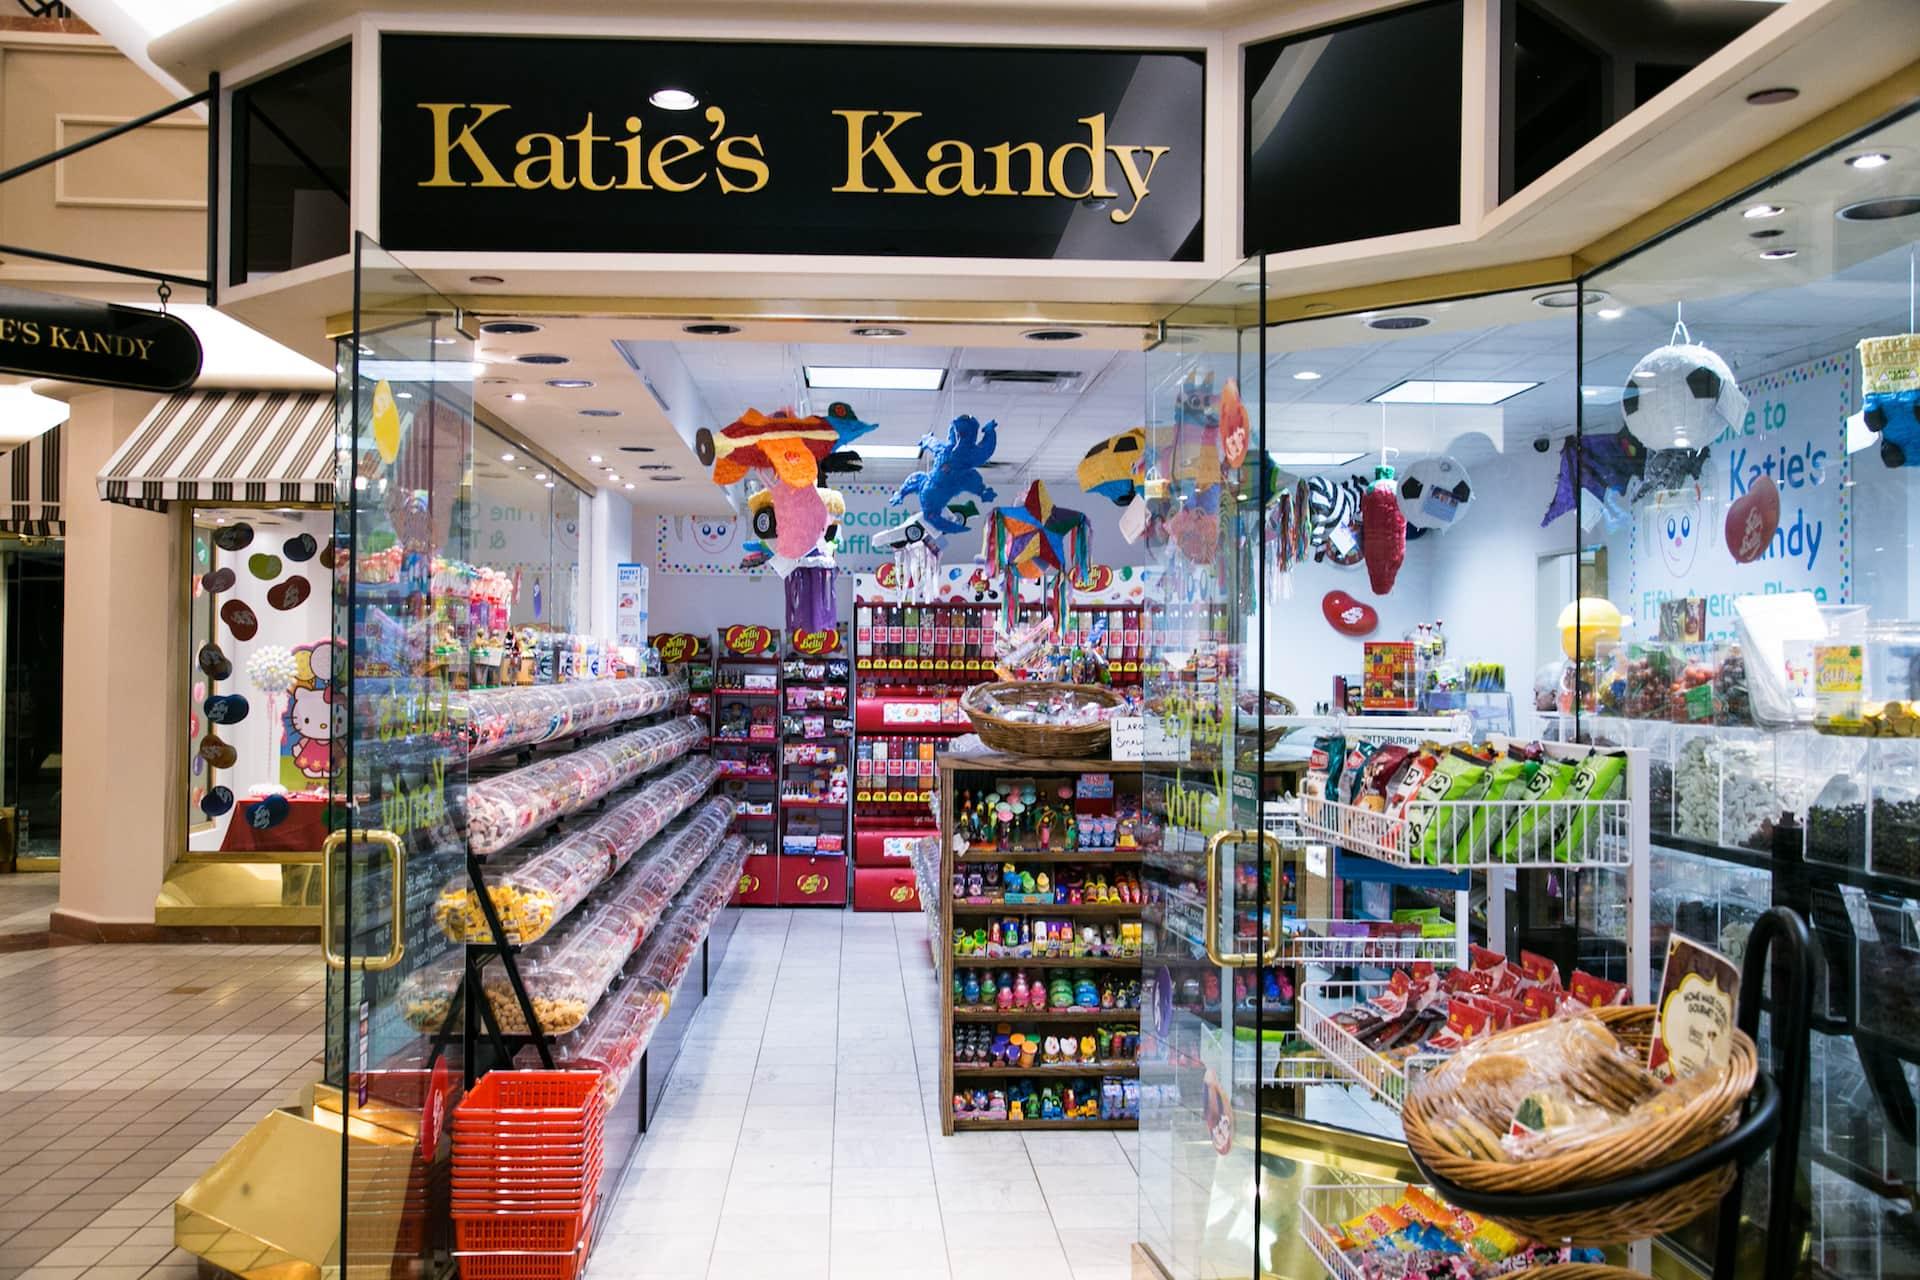 Katie's Kandy